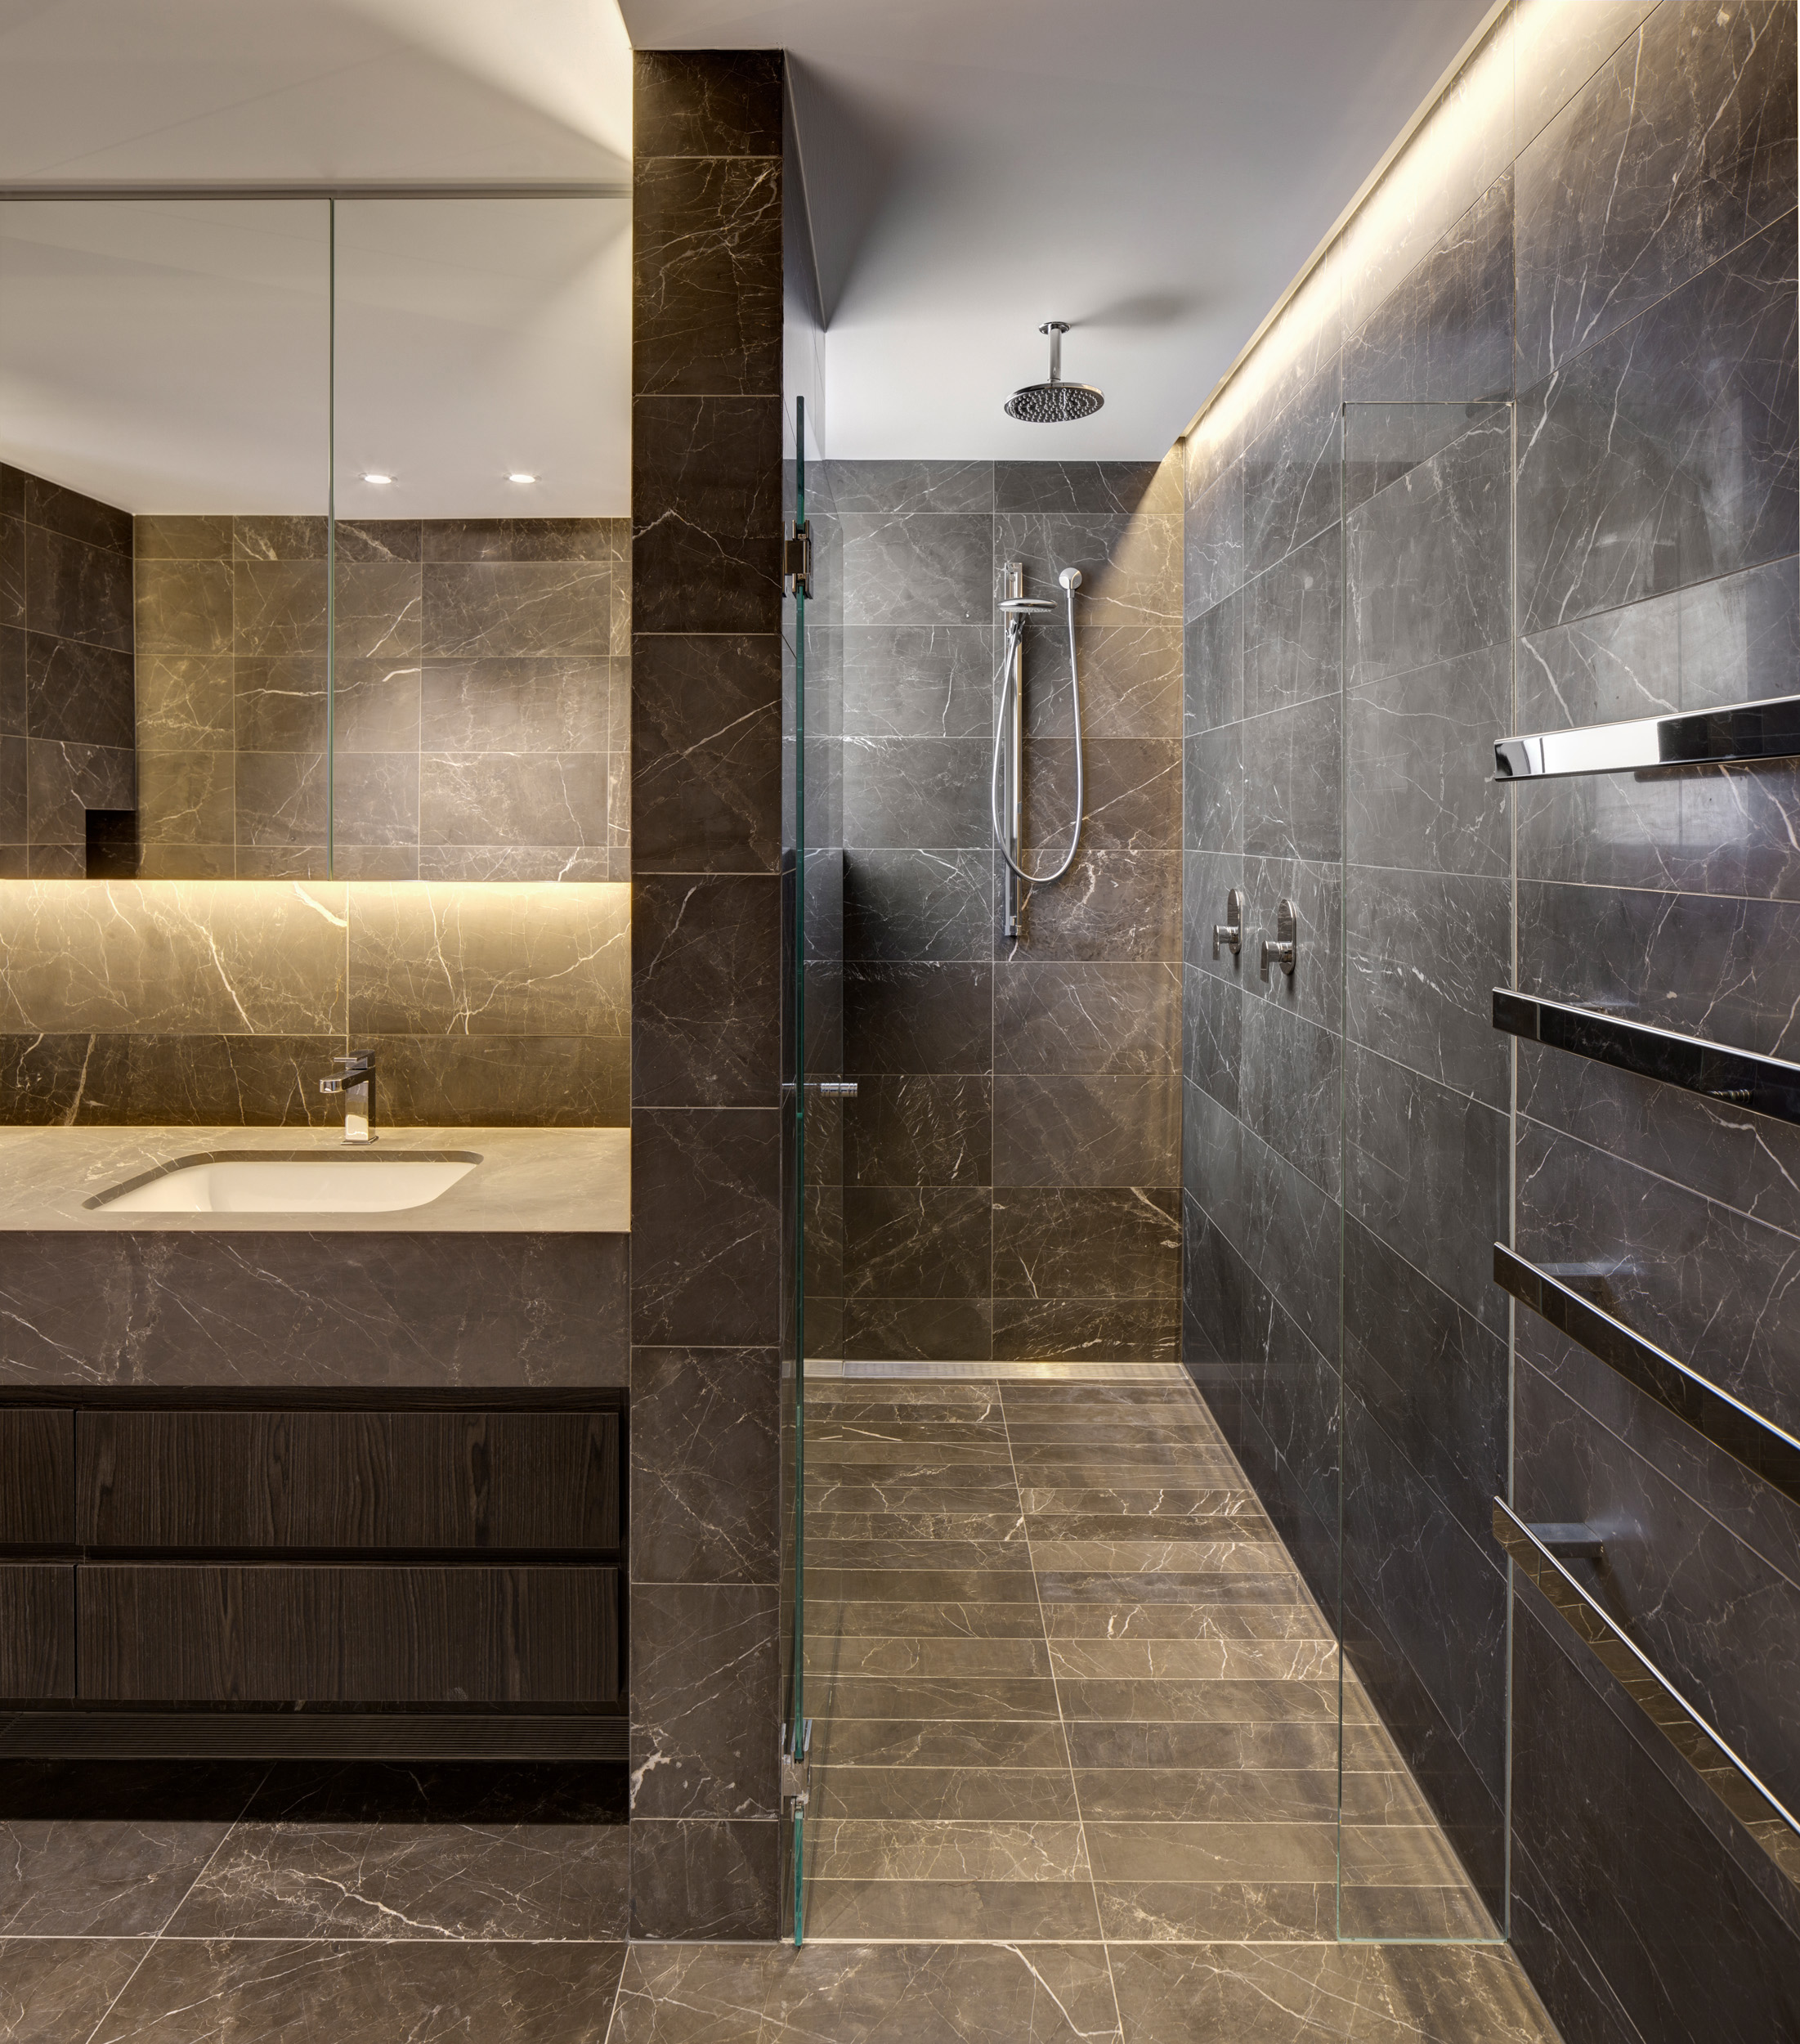 Jem_Cresswell_Architecture_Residential_Photographer_Sydney_Australia_027.jpg